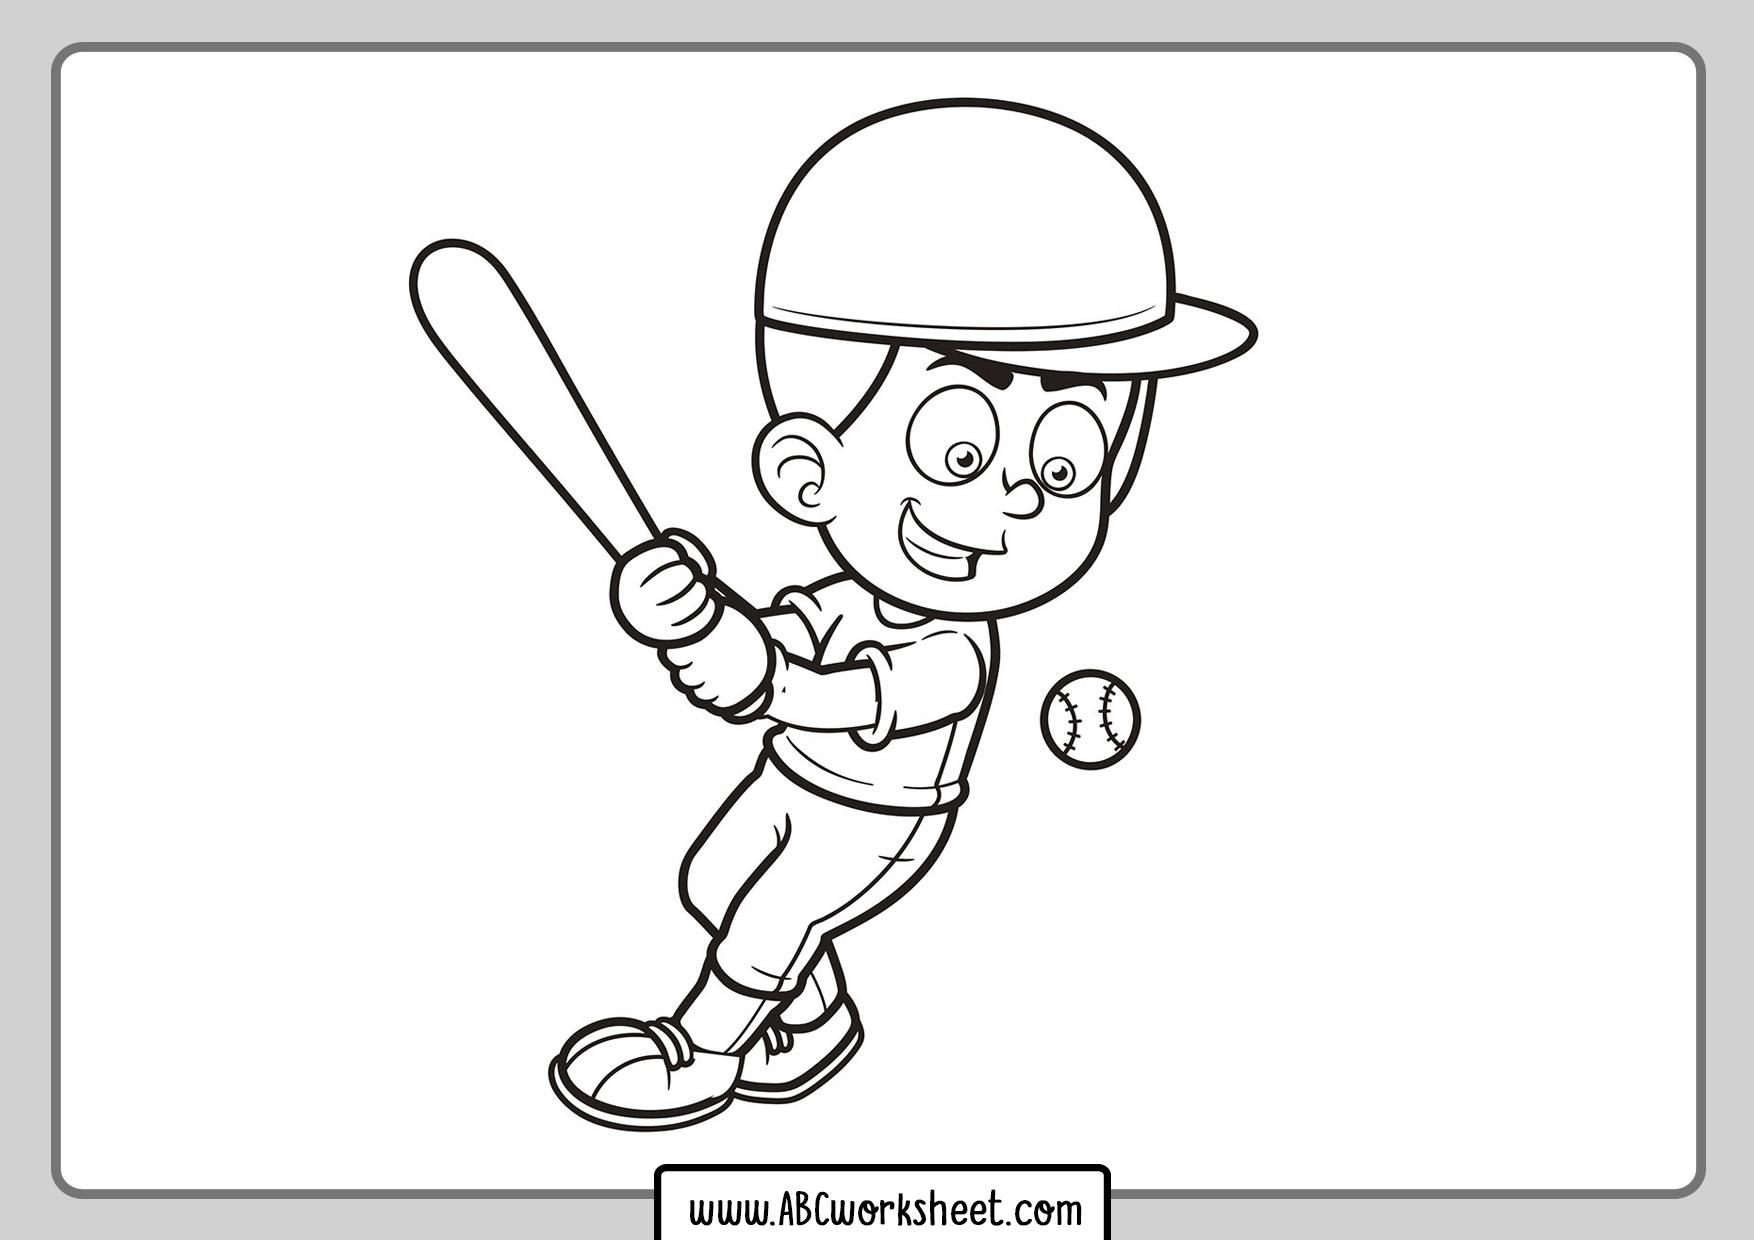 Kid Playing Baseball Coloring Page